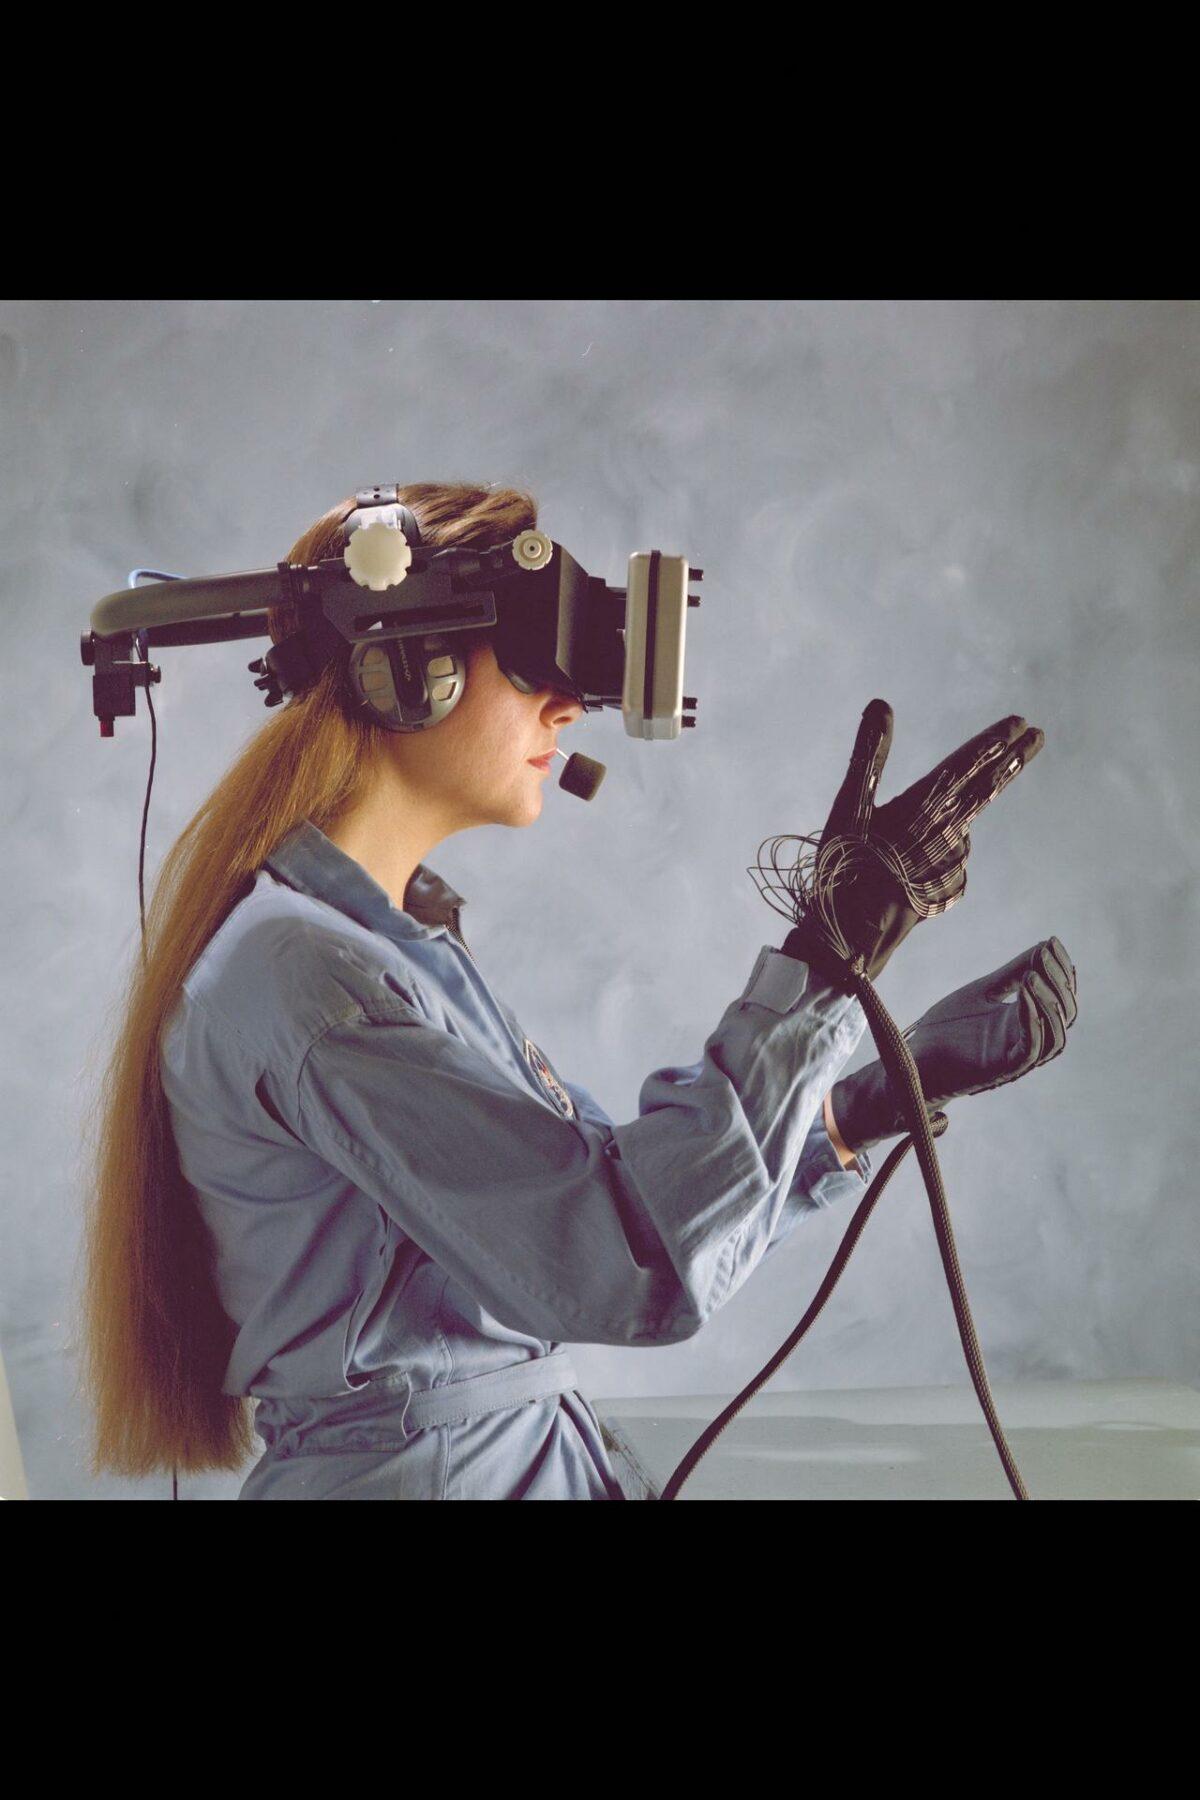 snijders & van est virtual reality